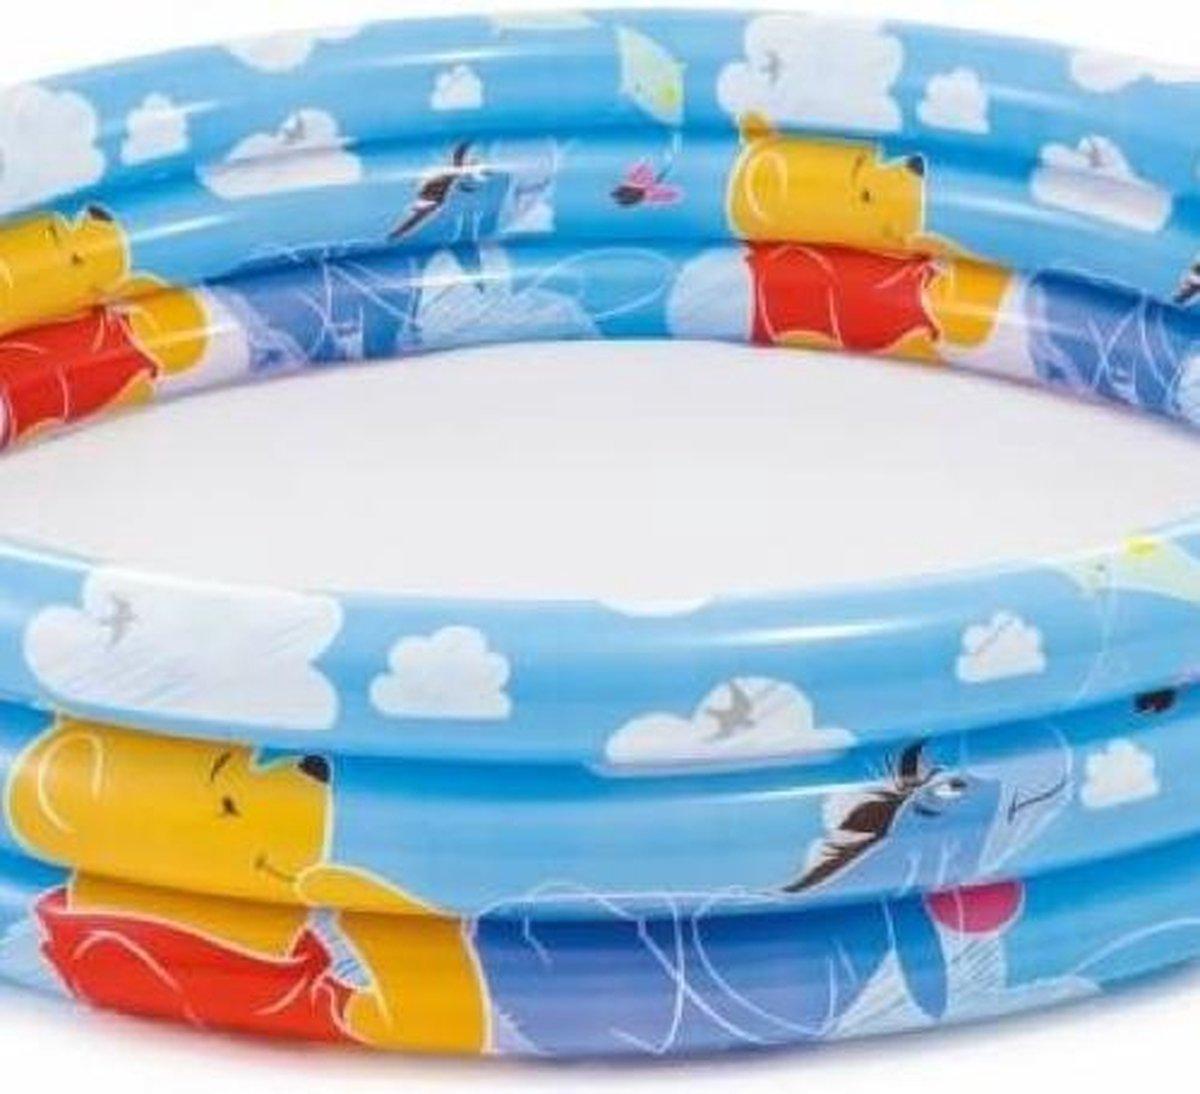 kinderzwembad winnie the pooh intex - strand - zee - speelgoed - kinderen - spelen - strandspeelgoed - speelgoed voor kinderen - zandbak - zandbak speelgoed - zwembad - kinderzwembad -